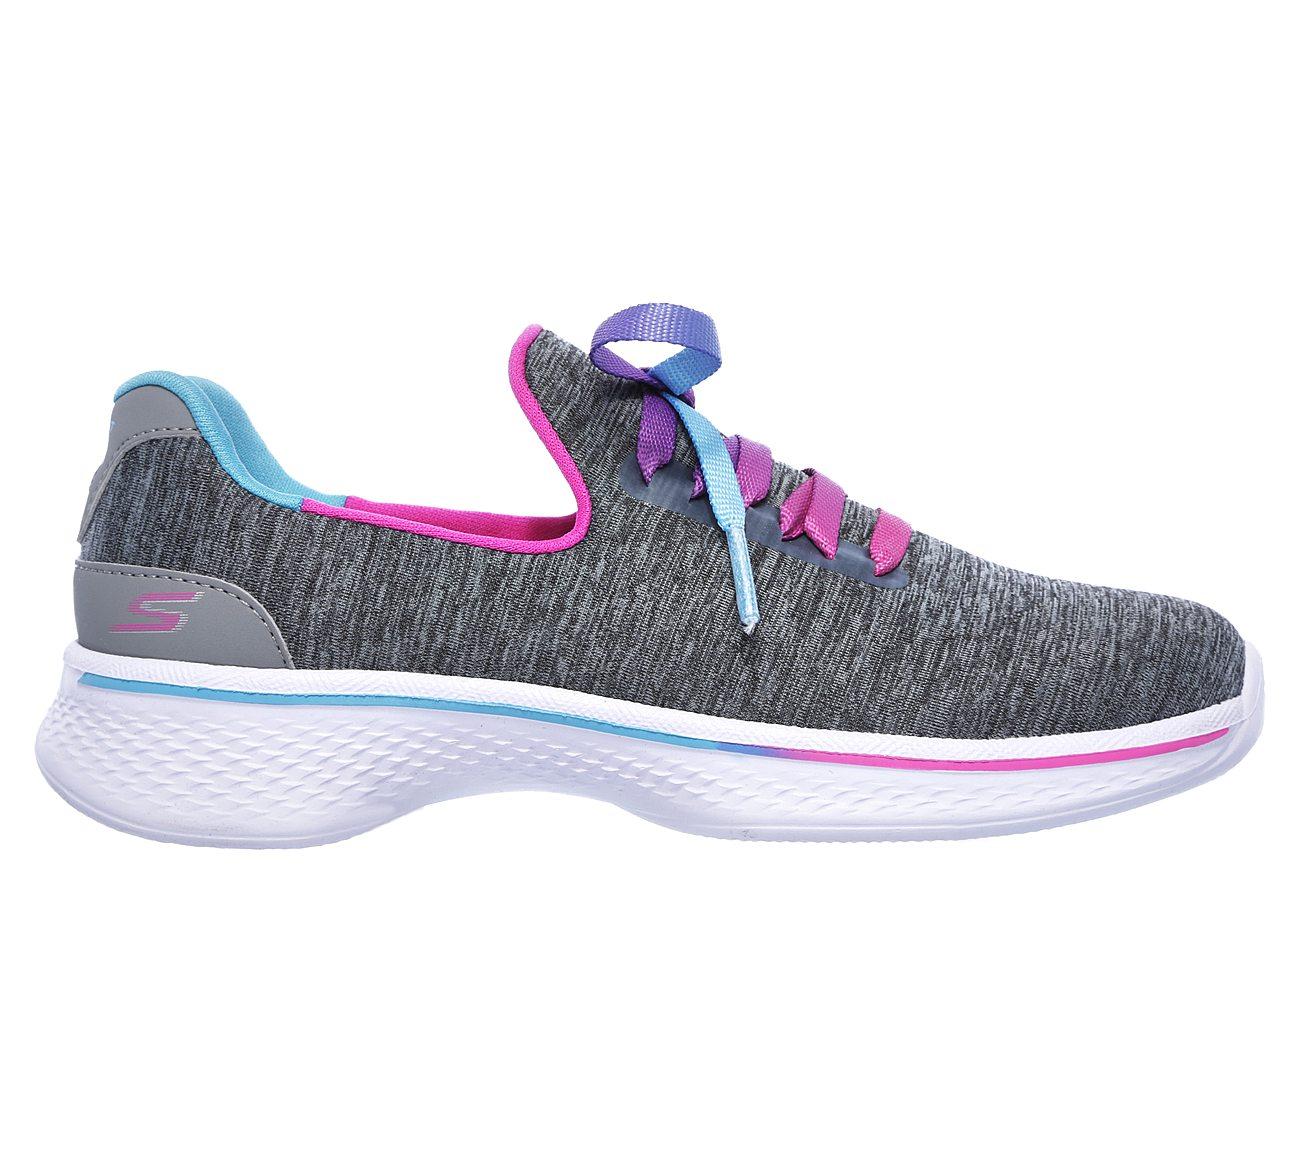 Buy SKECHERS Skechers GOwalk 4 - All Day Comfort Skechers ... 7e9d20d29